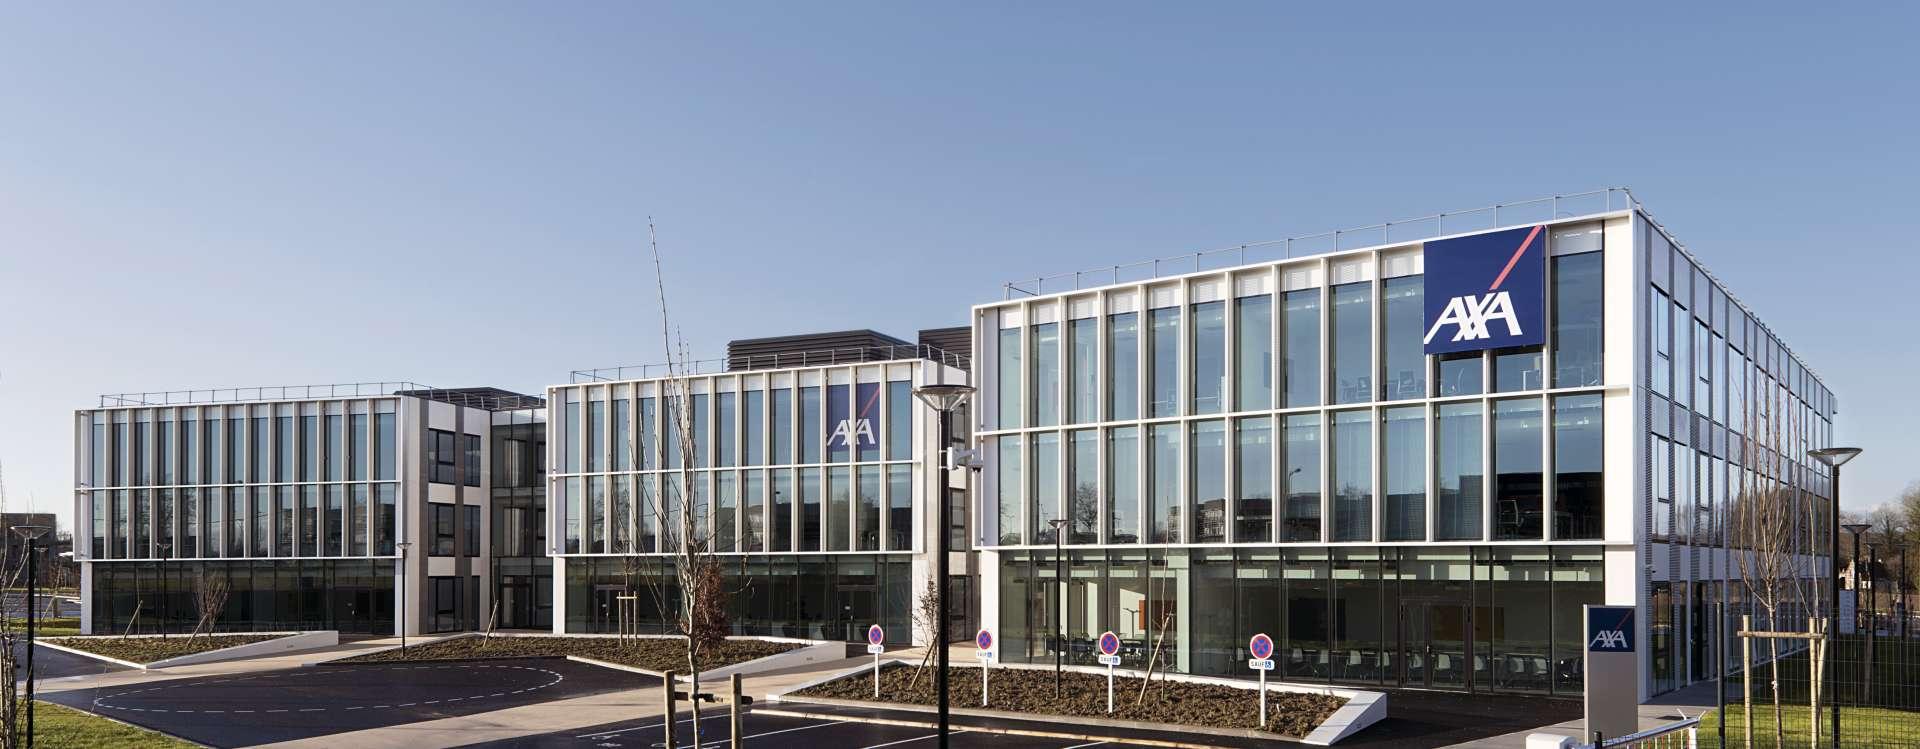 Sunny, AXA's 8,000 m² regional headquarters in Isneauville